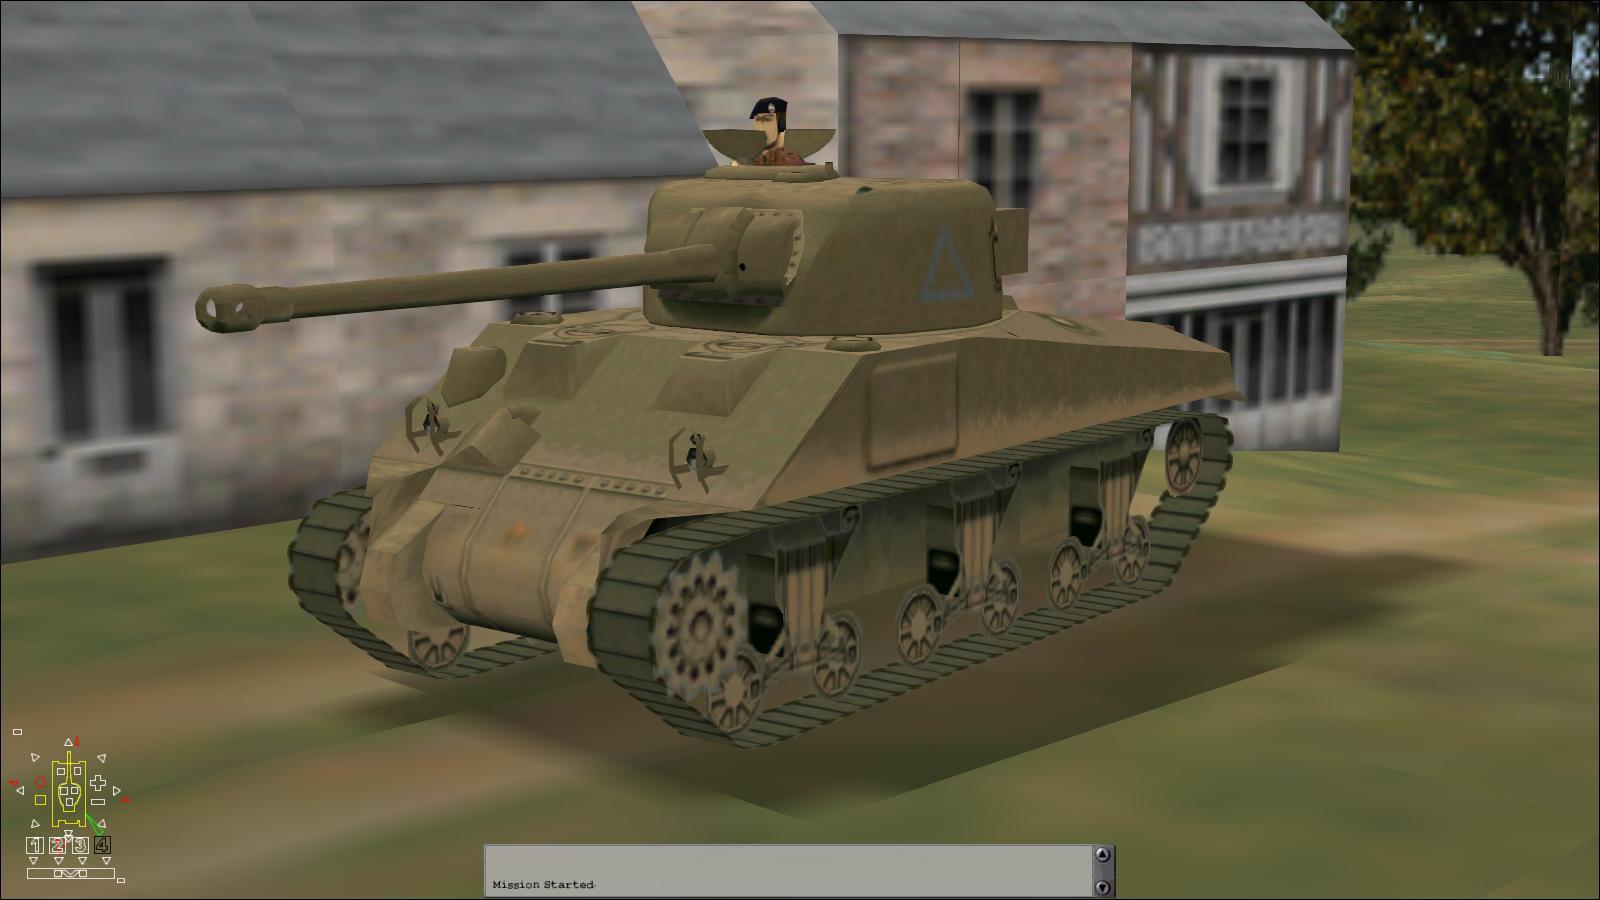 Panzer Elite - Britpack '44-x beta - Sherman VC 'Firefly'